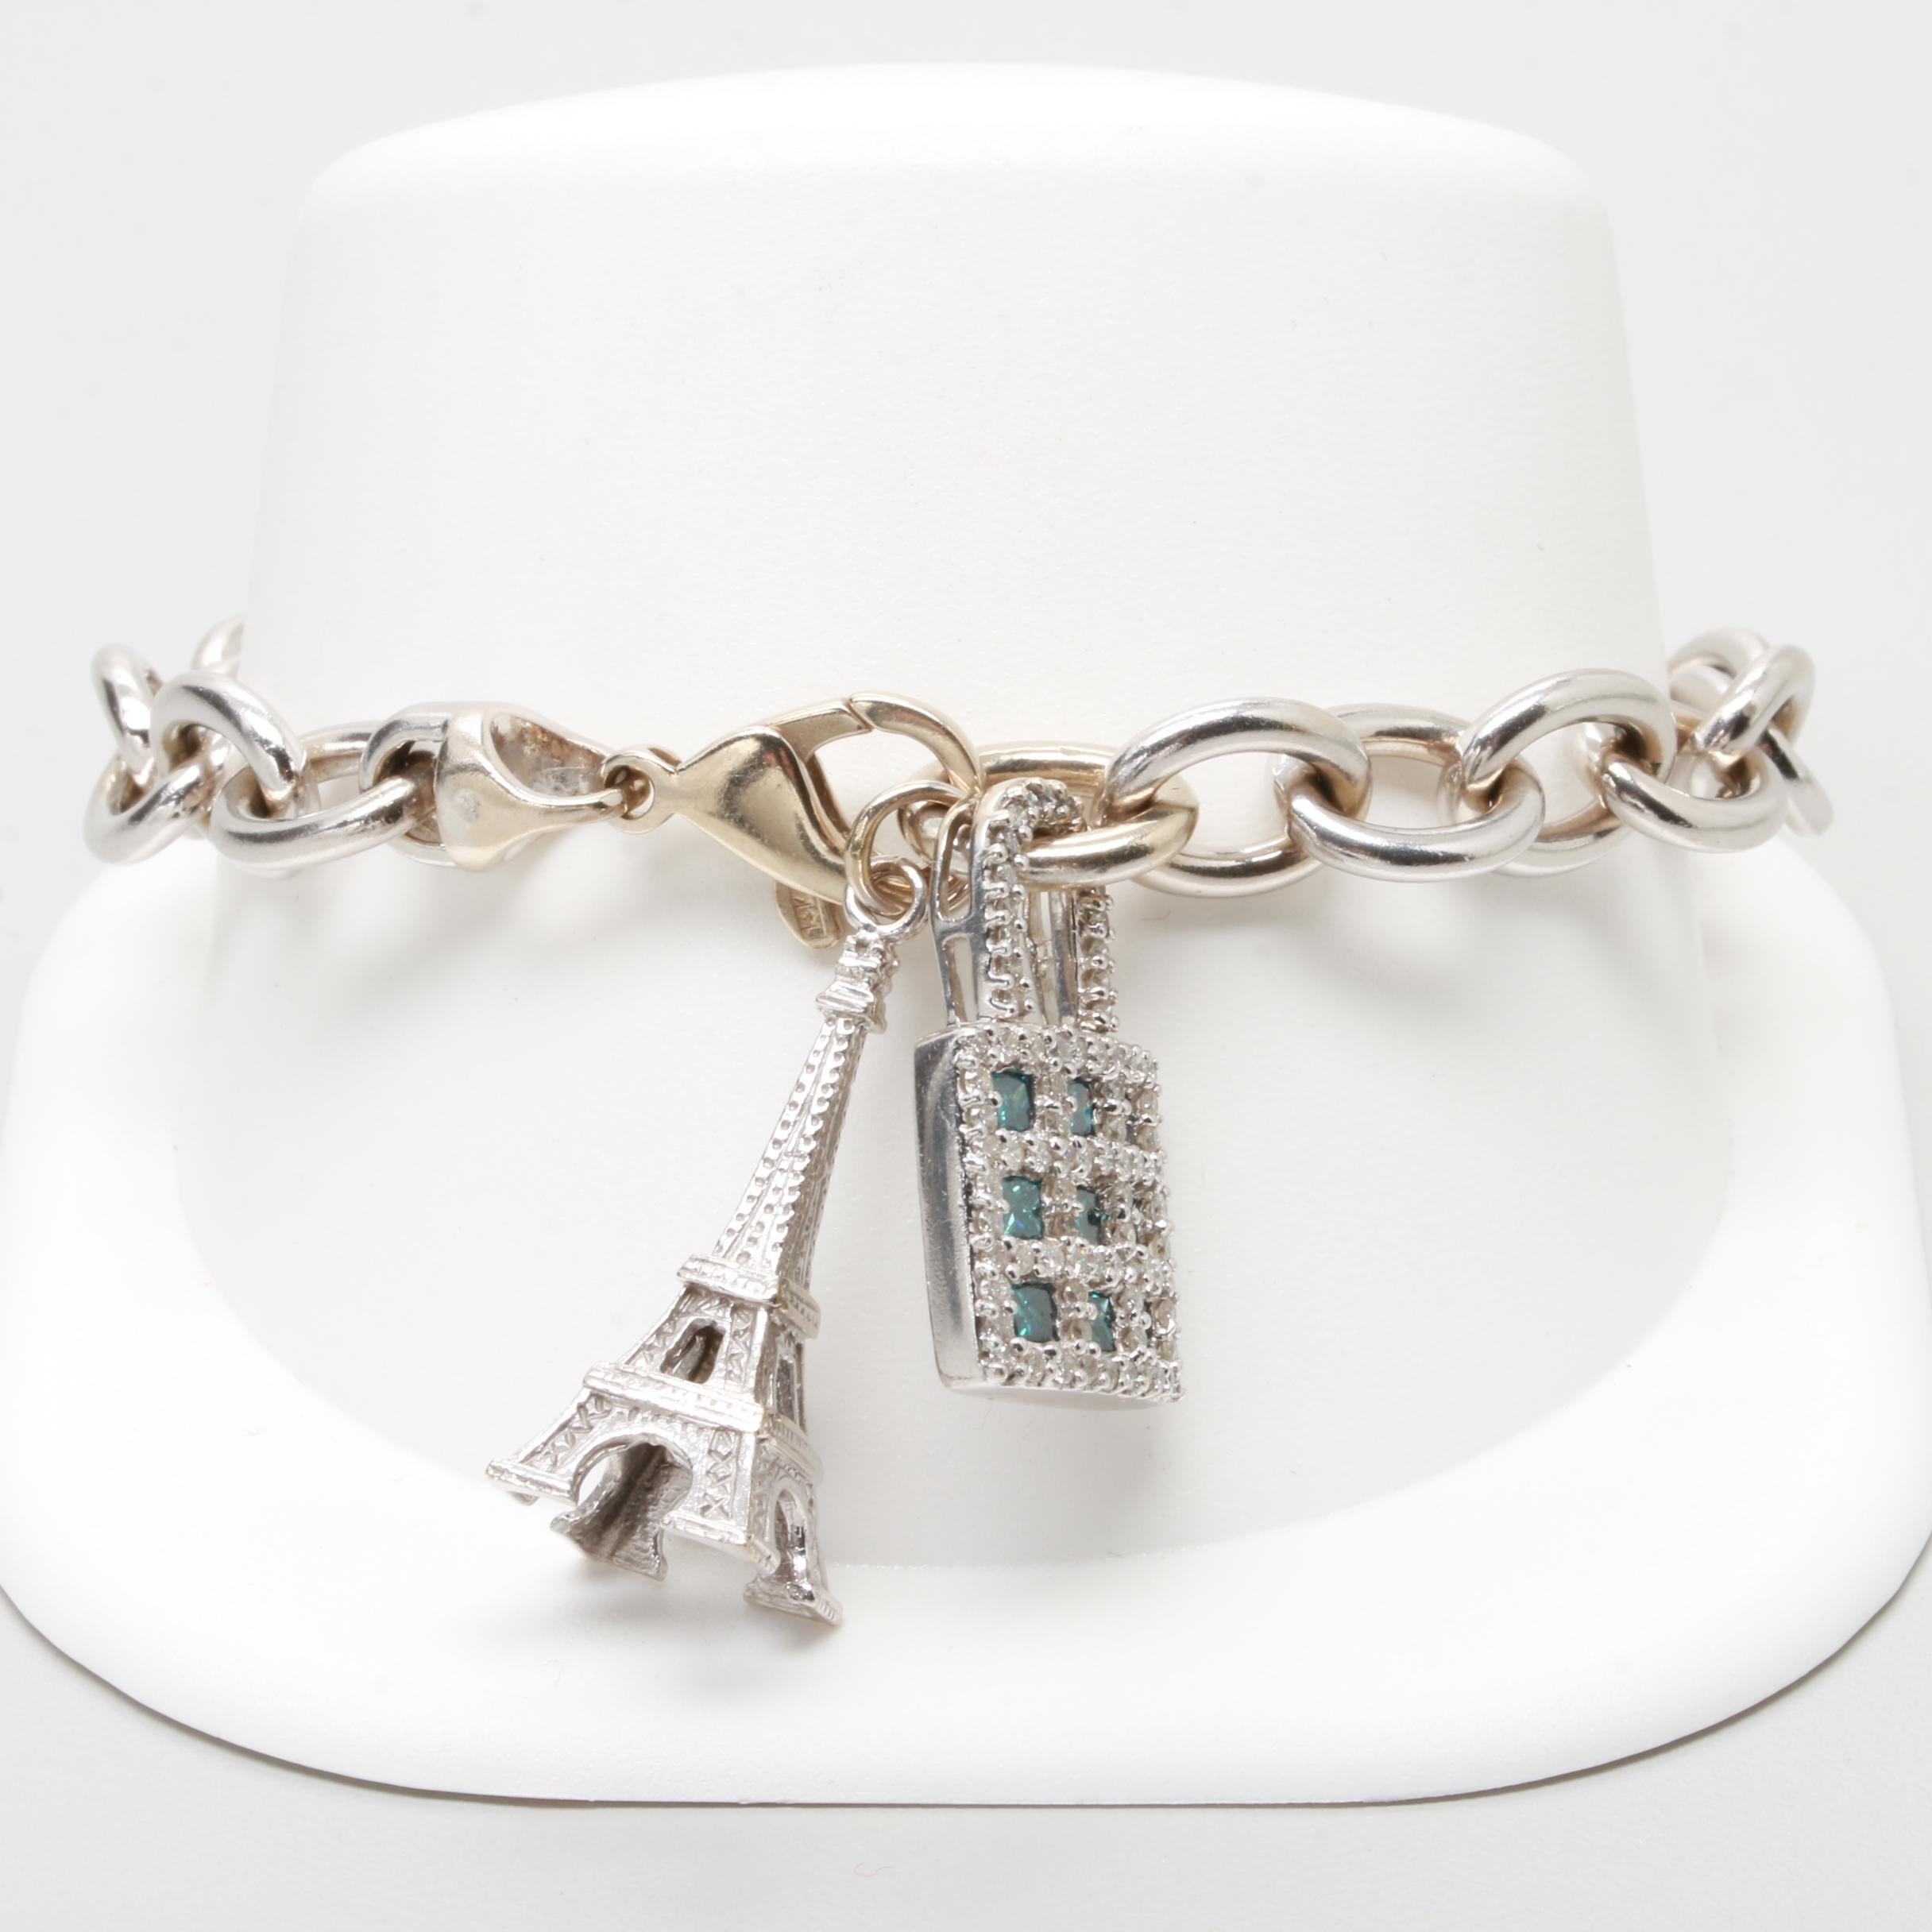 14K White Gold 1.19 CTW Diamond Bracelet with Charms